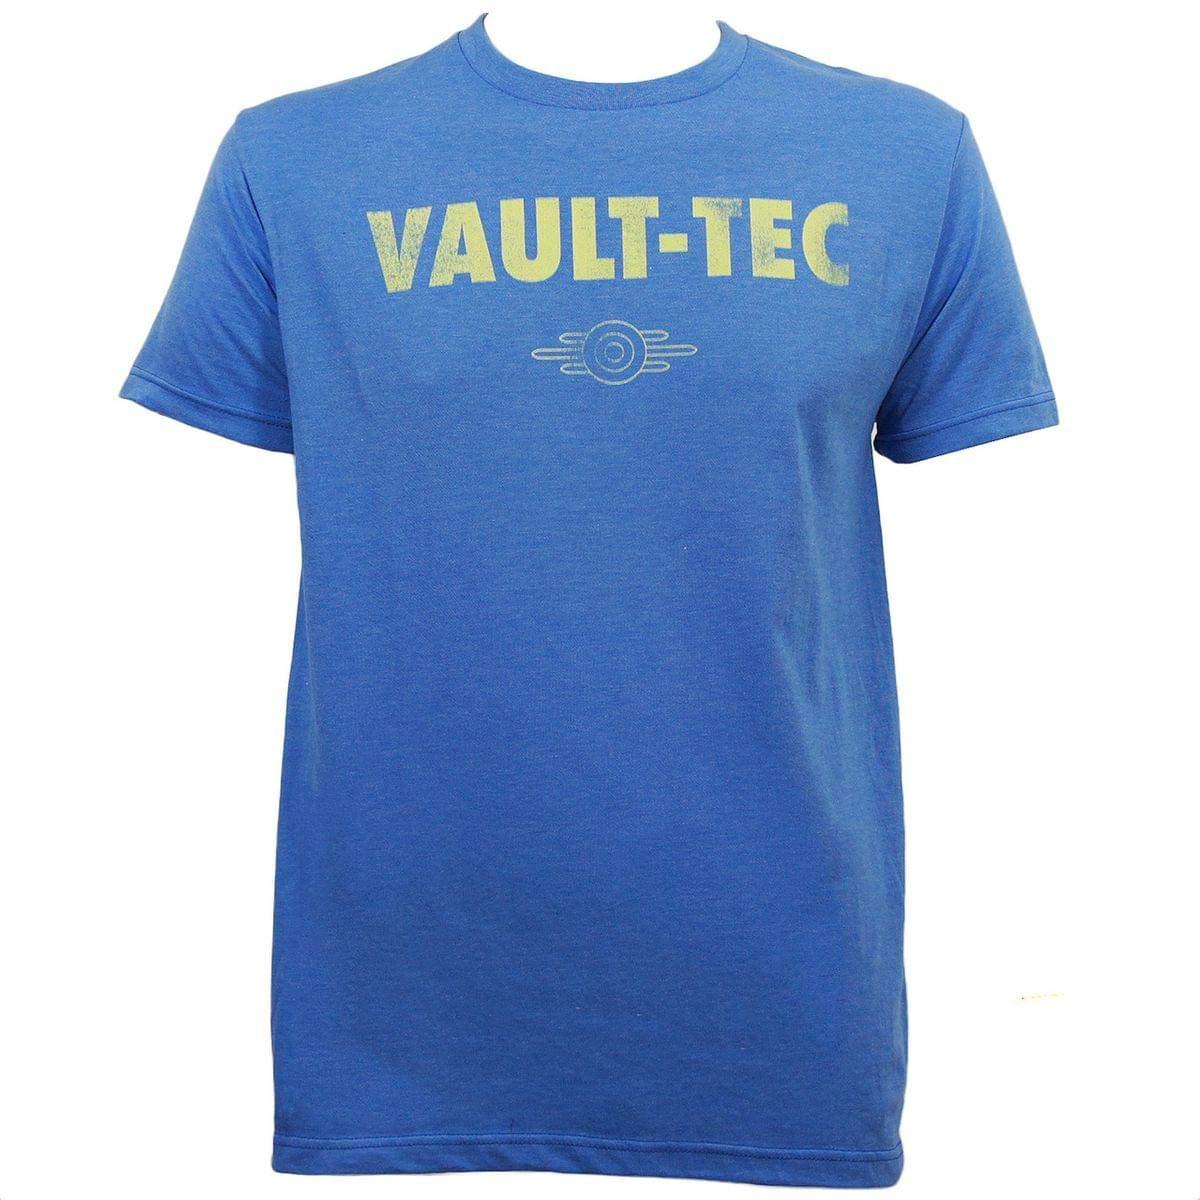 Fallout Vault Tec Heather Blue T-Shirt